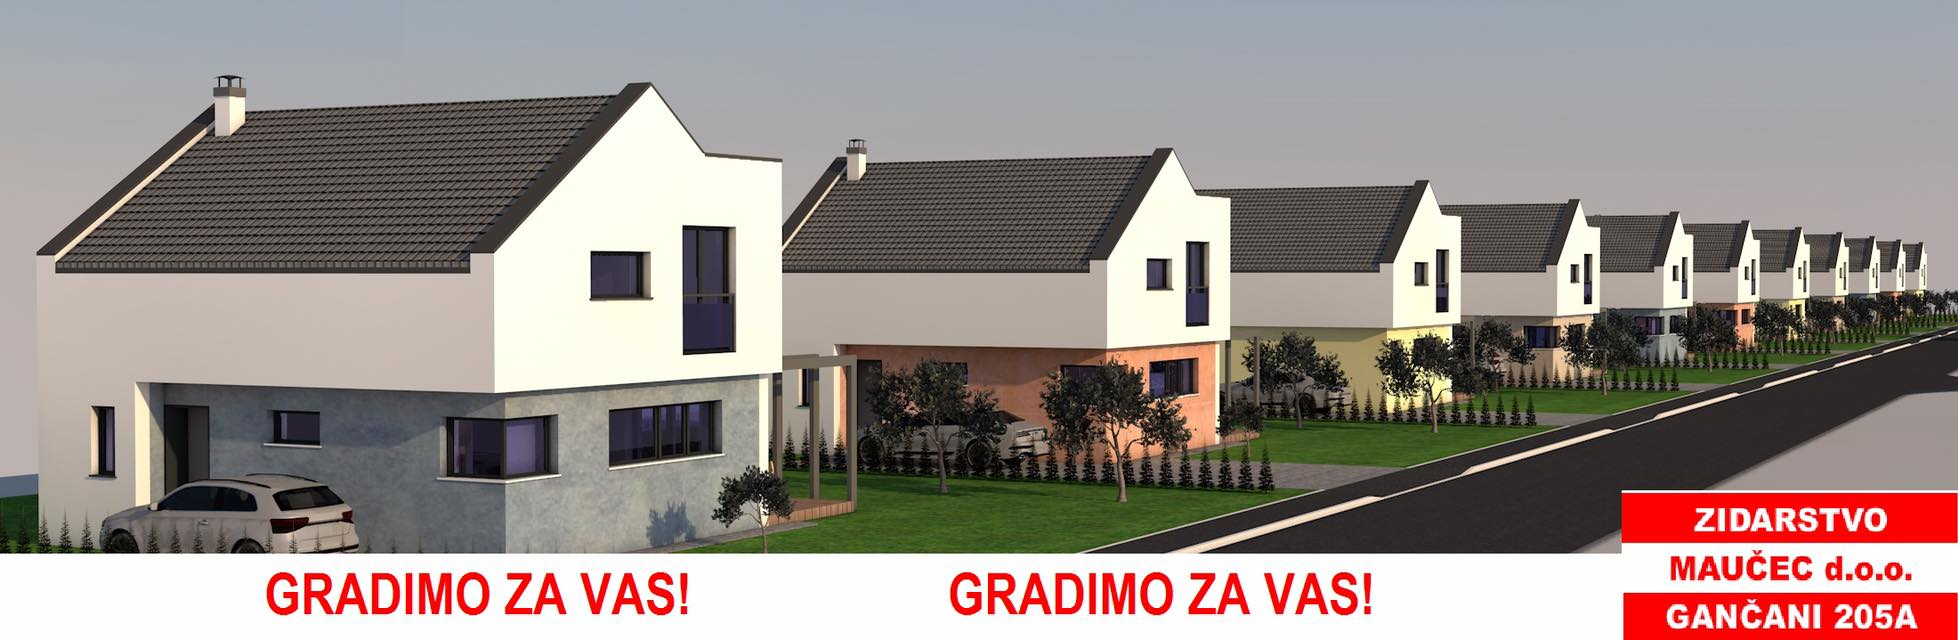 gradimo_za_vas